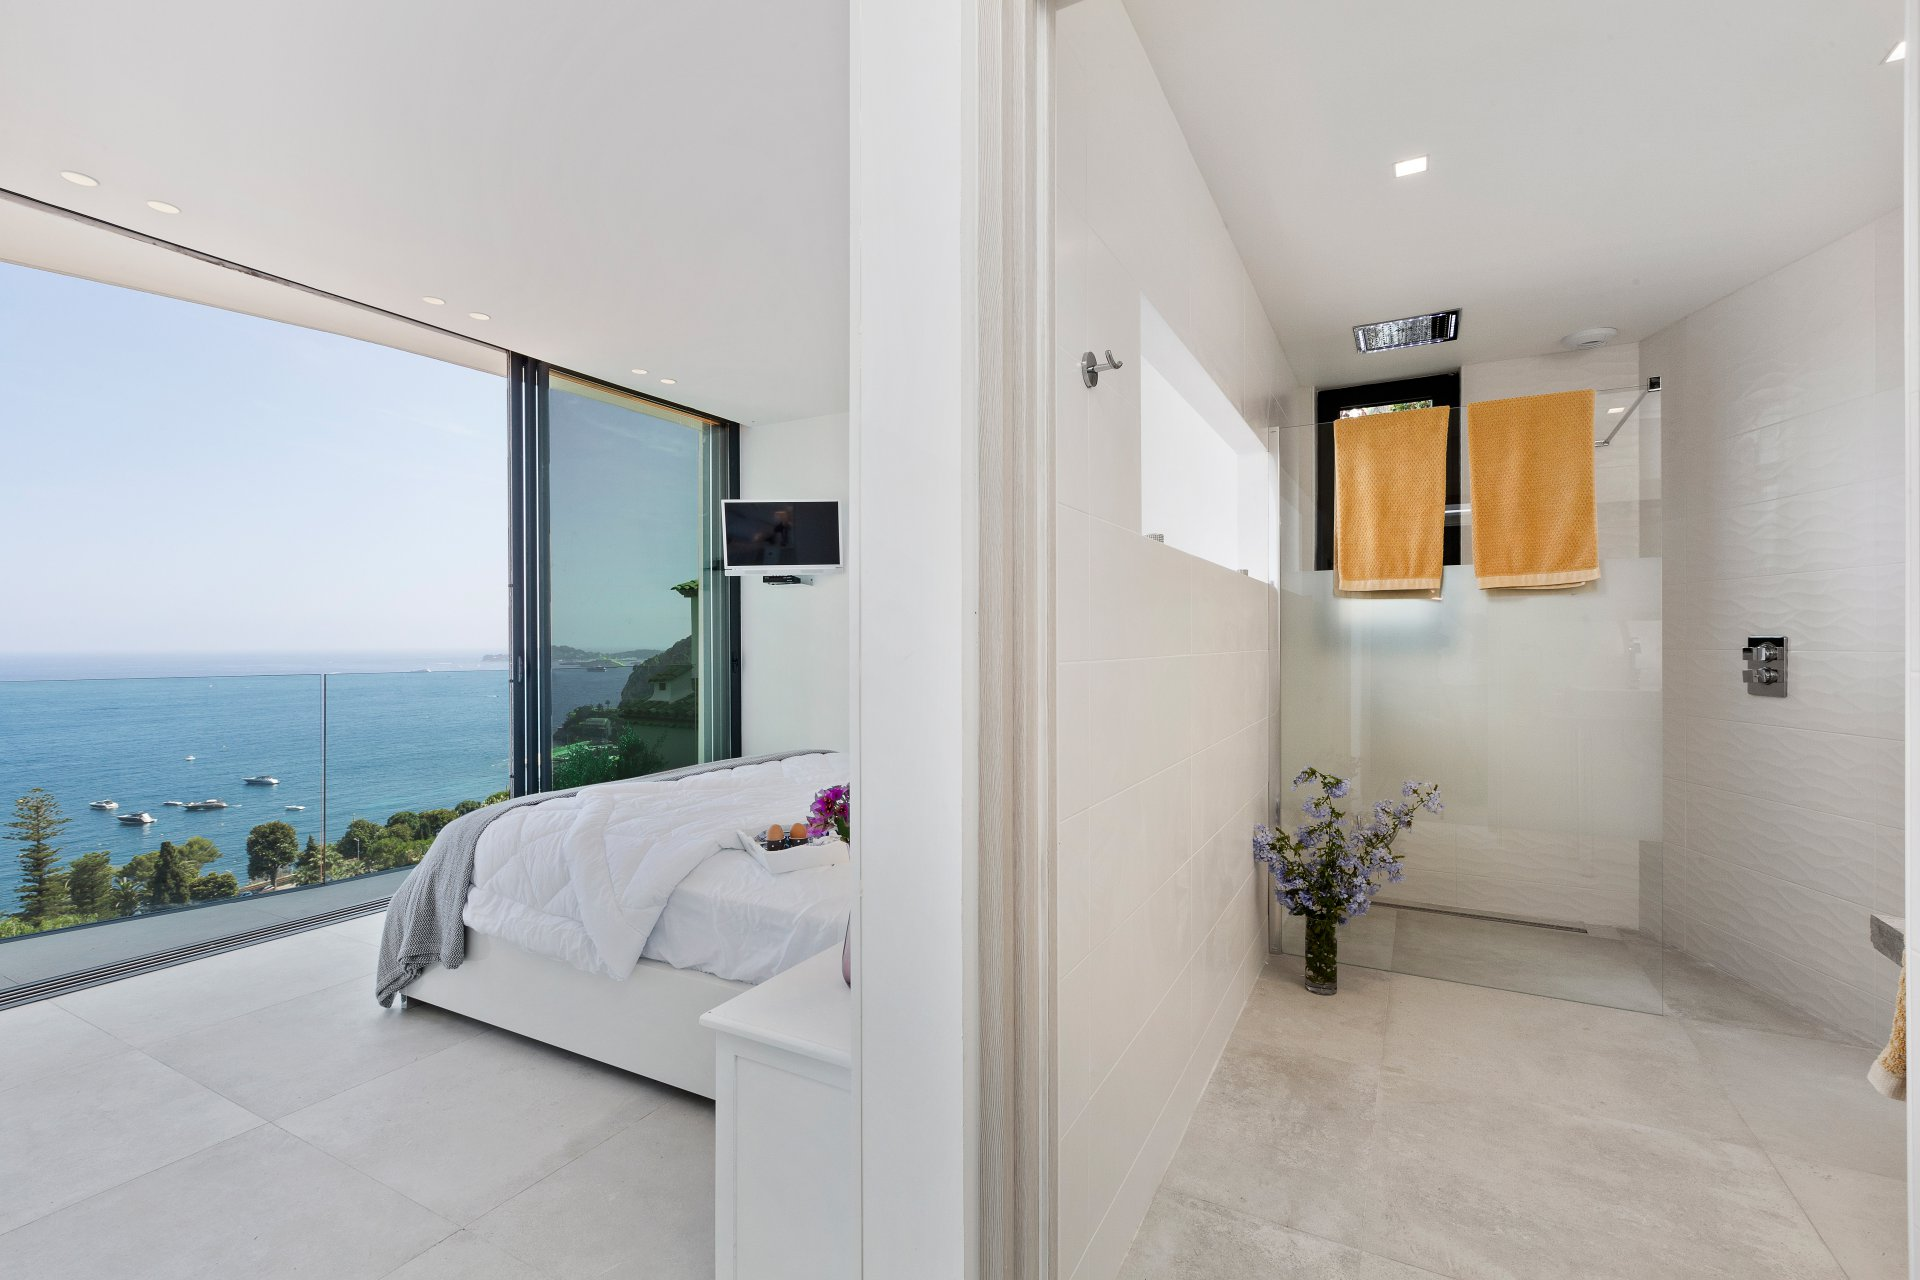 Location villa de luxe cote d azur eze entre nice et monaco proche for Location villa